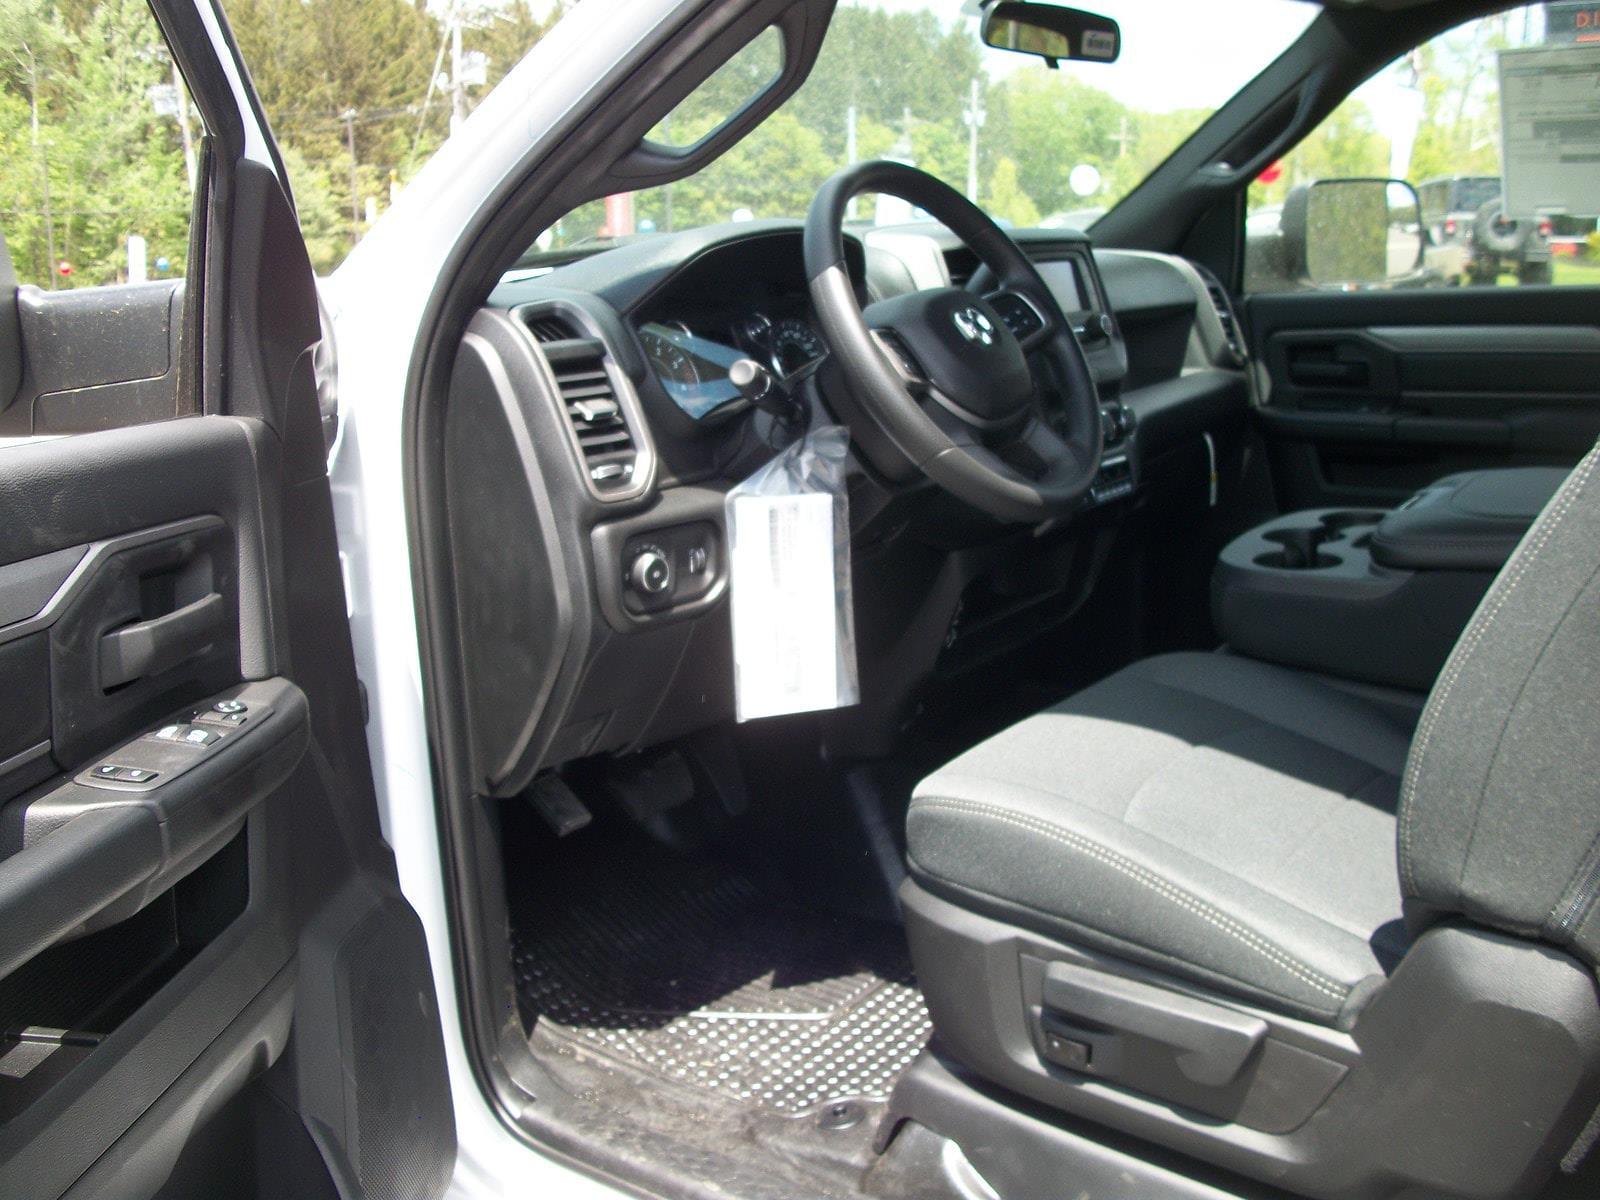 2021 Ram 5500 Regular Cab DRW 4x4,  Cab Chassis #21590 - photo 9